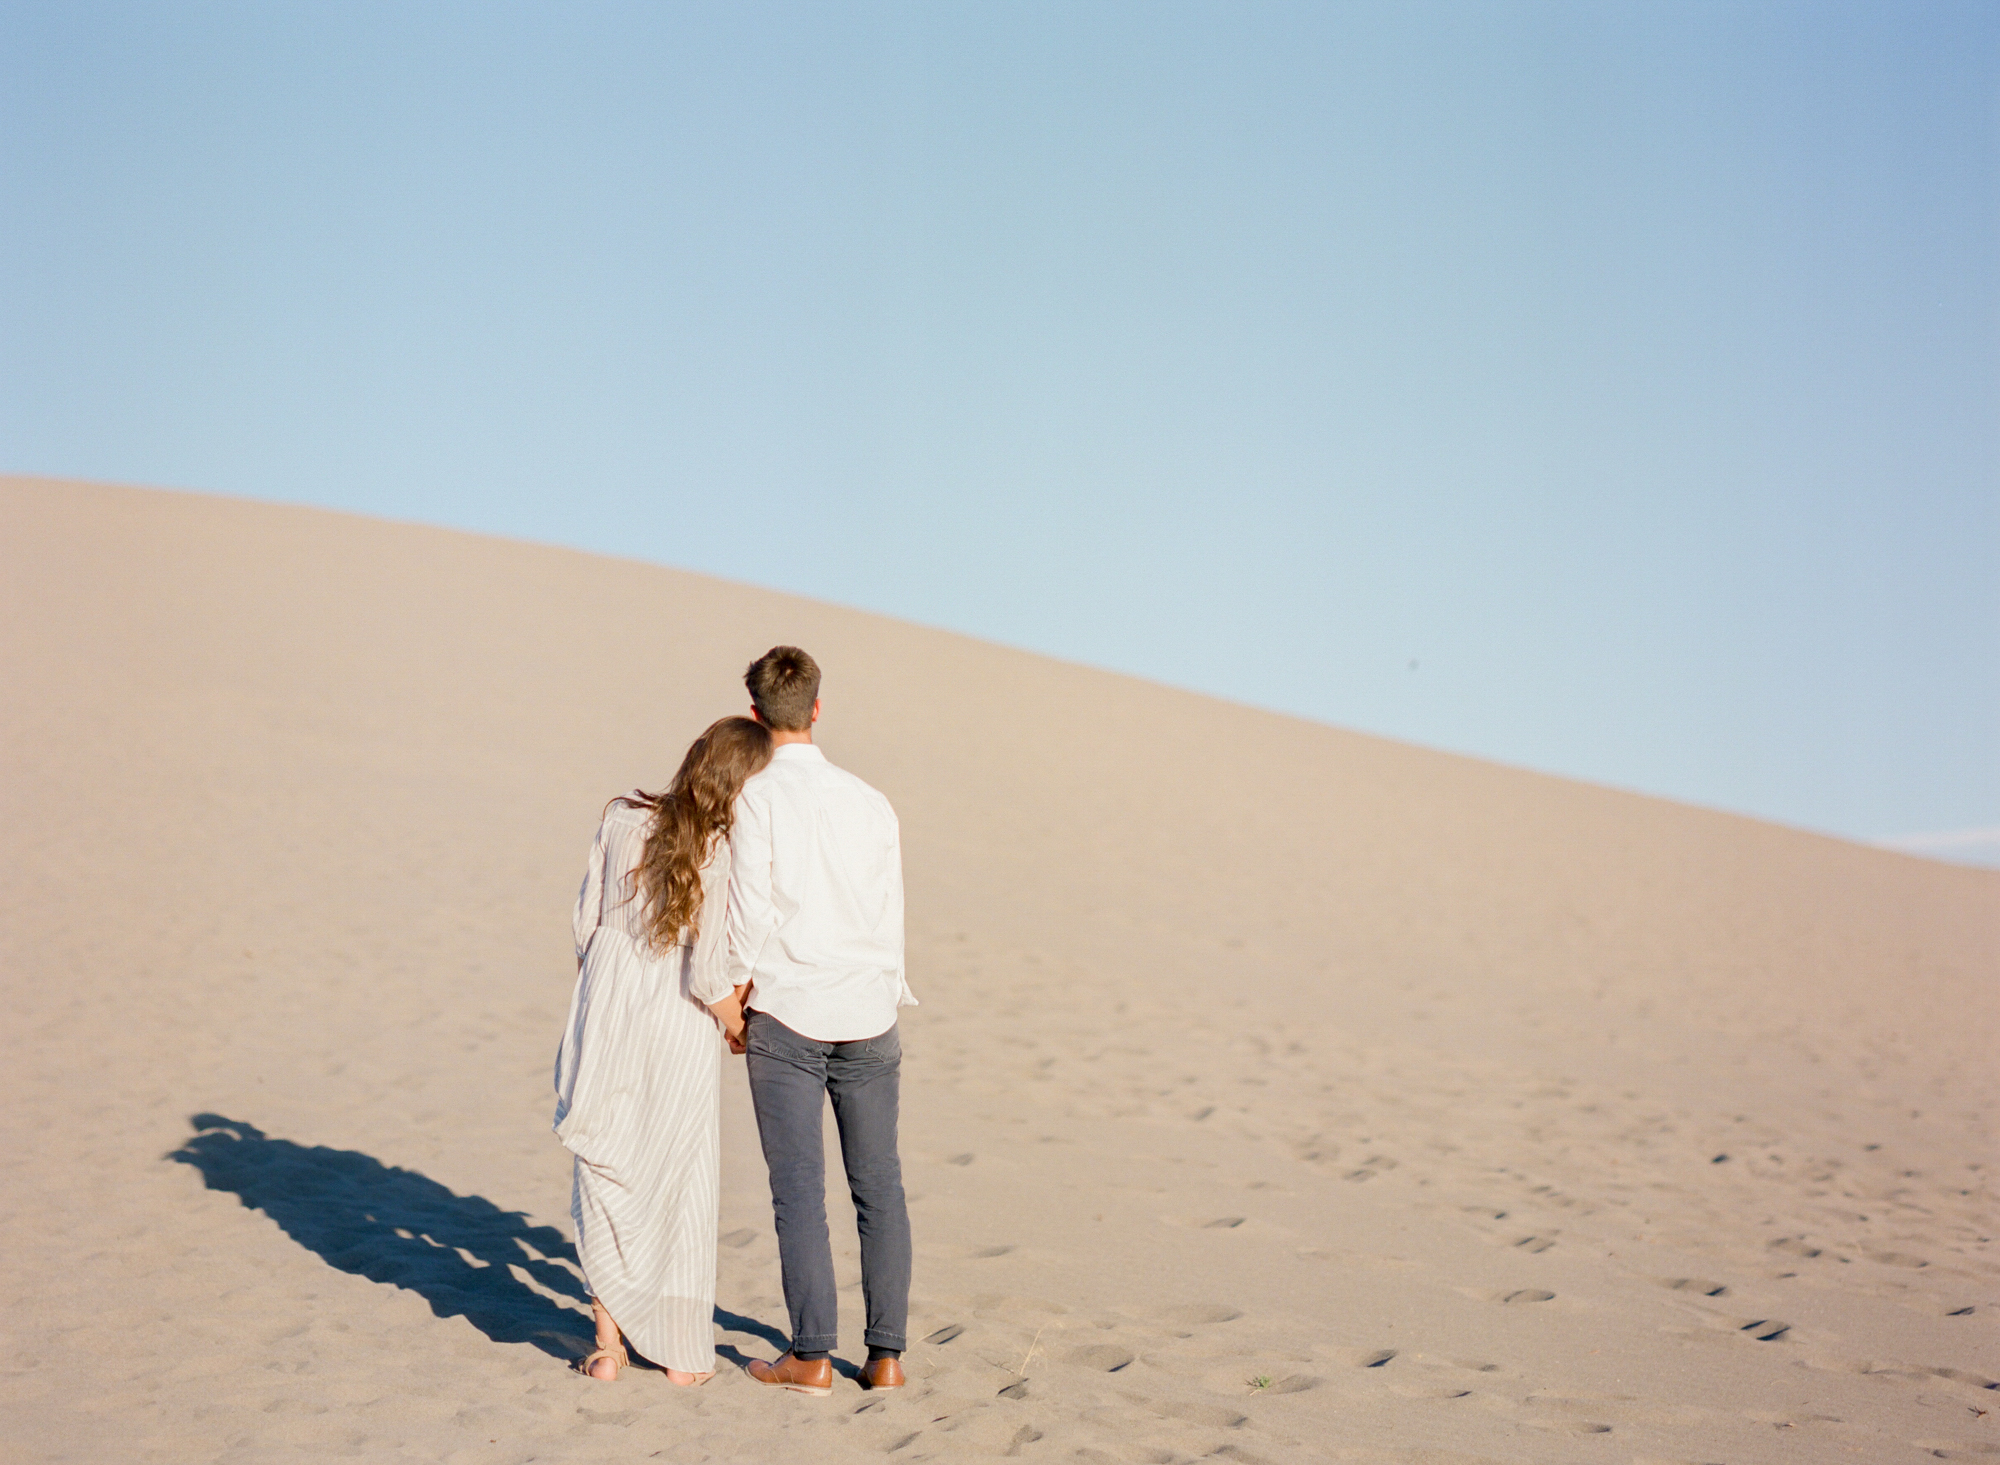 charlotte-charleston-wedding-family-film-destination-photographer-bruneau-sand-dunes-boise-idaho-12.jpg